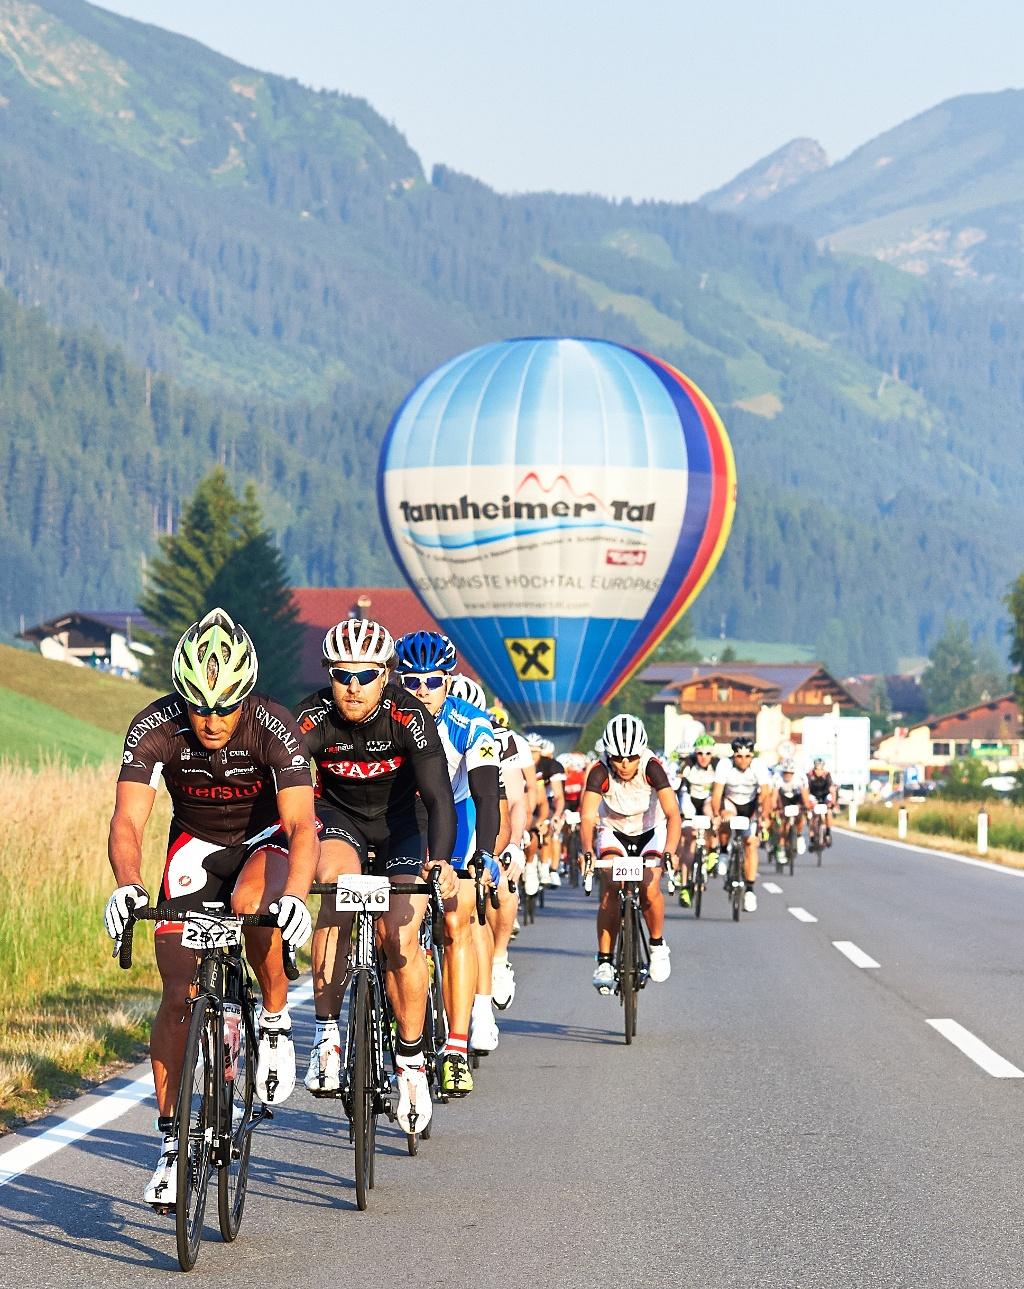 Rad-Marathon Tannheimer Tal Start  - @ Autor: Michael Keller  - © Quelle: Tourismusverband Tannheimer Tal